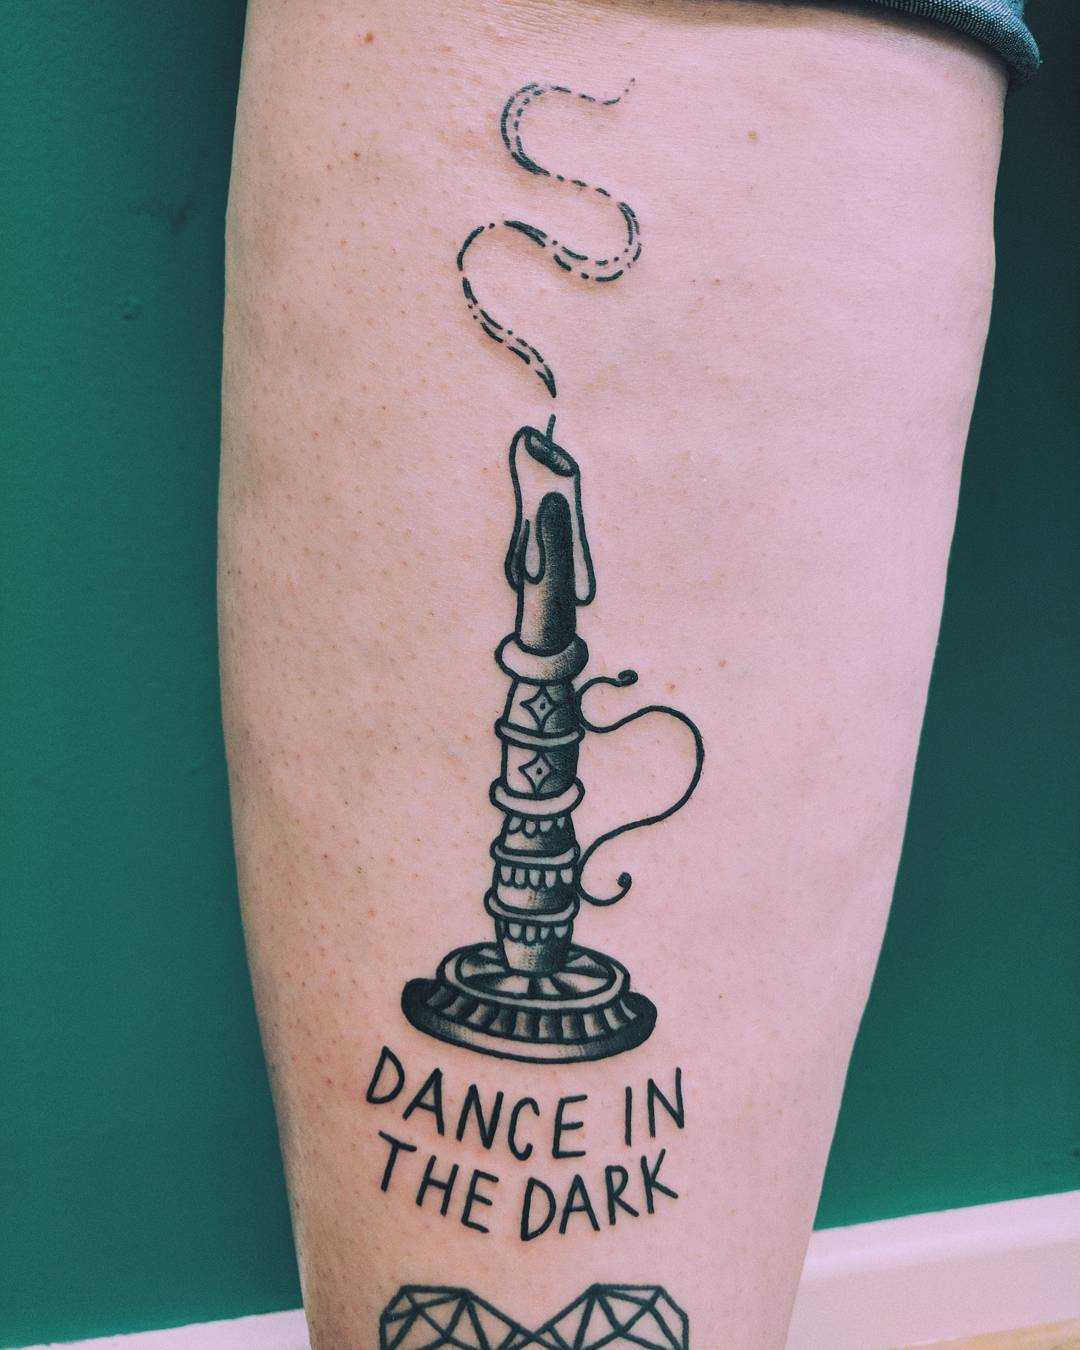 Dance in the dark by Tristan Ritter